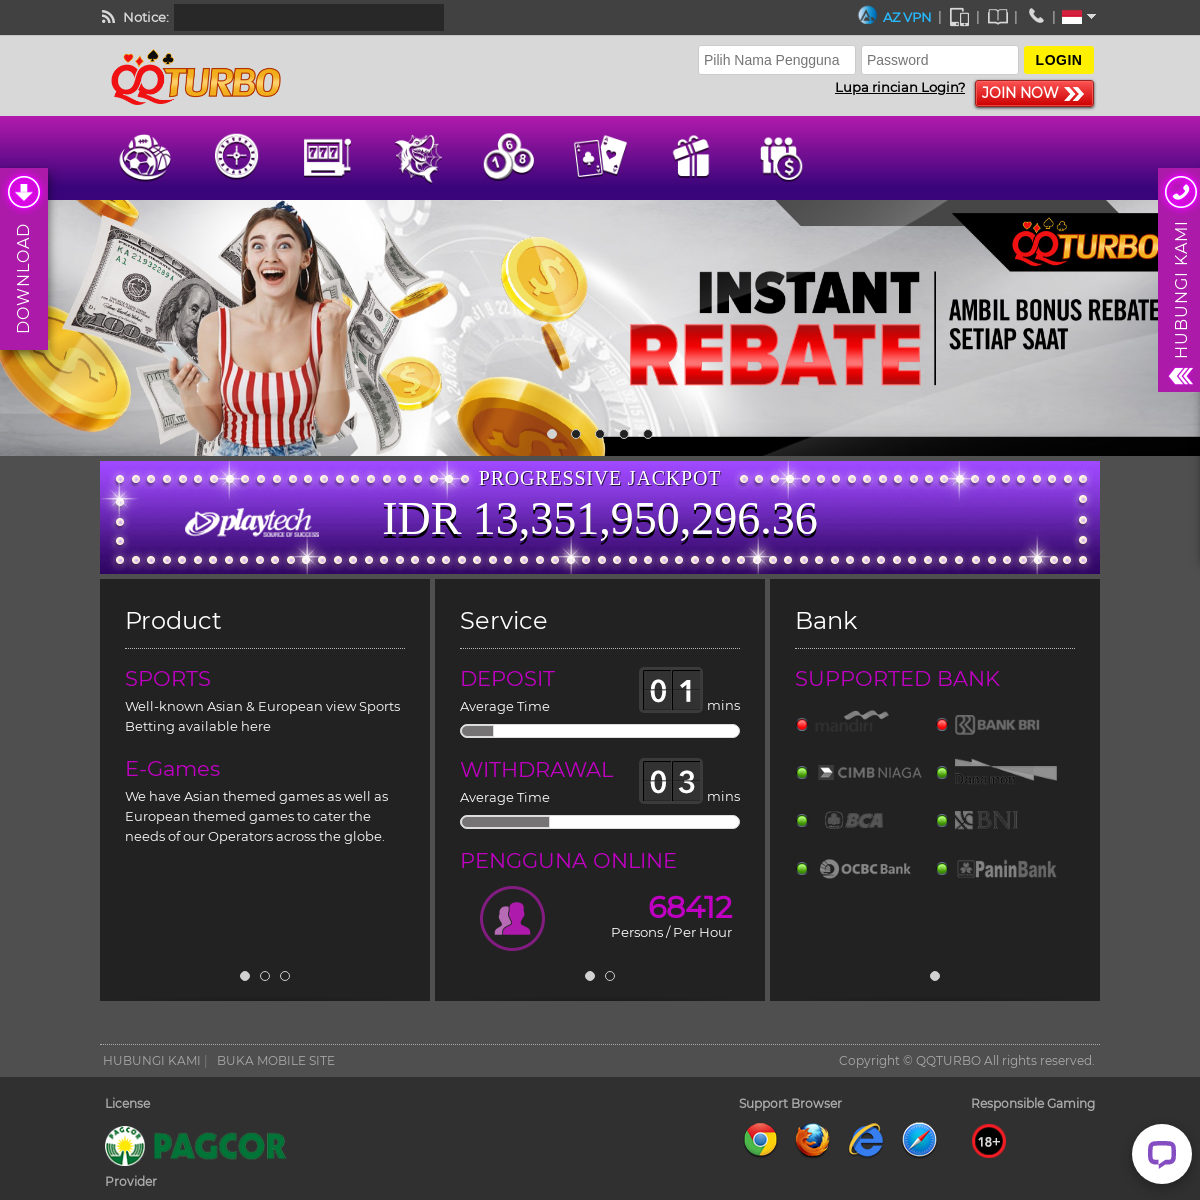 Qqturbo Situs Judi Online Agen Bola Judi Slot Online